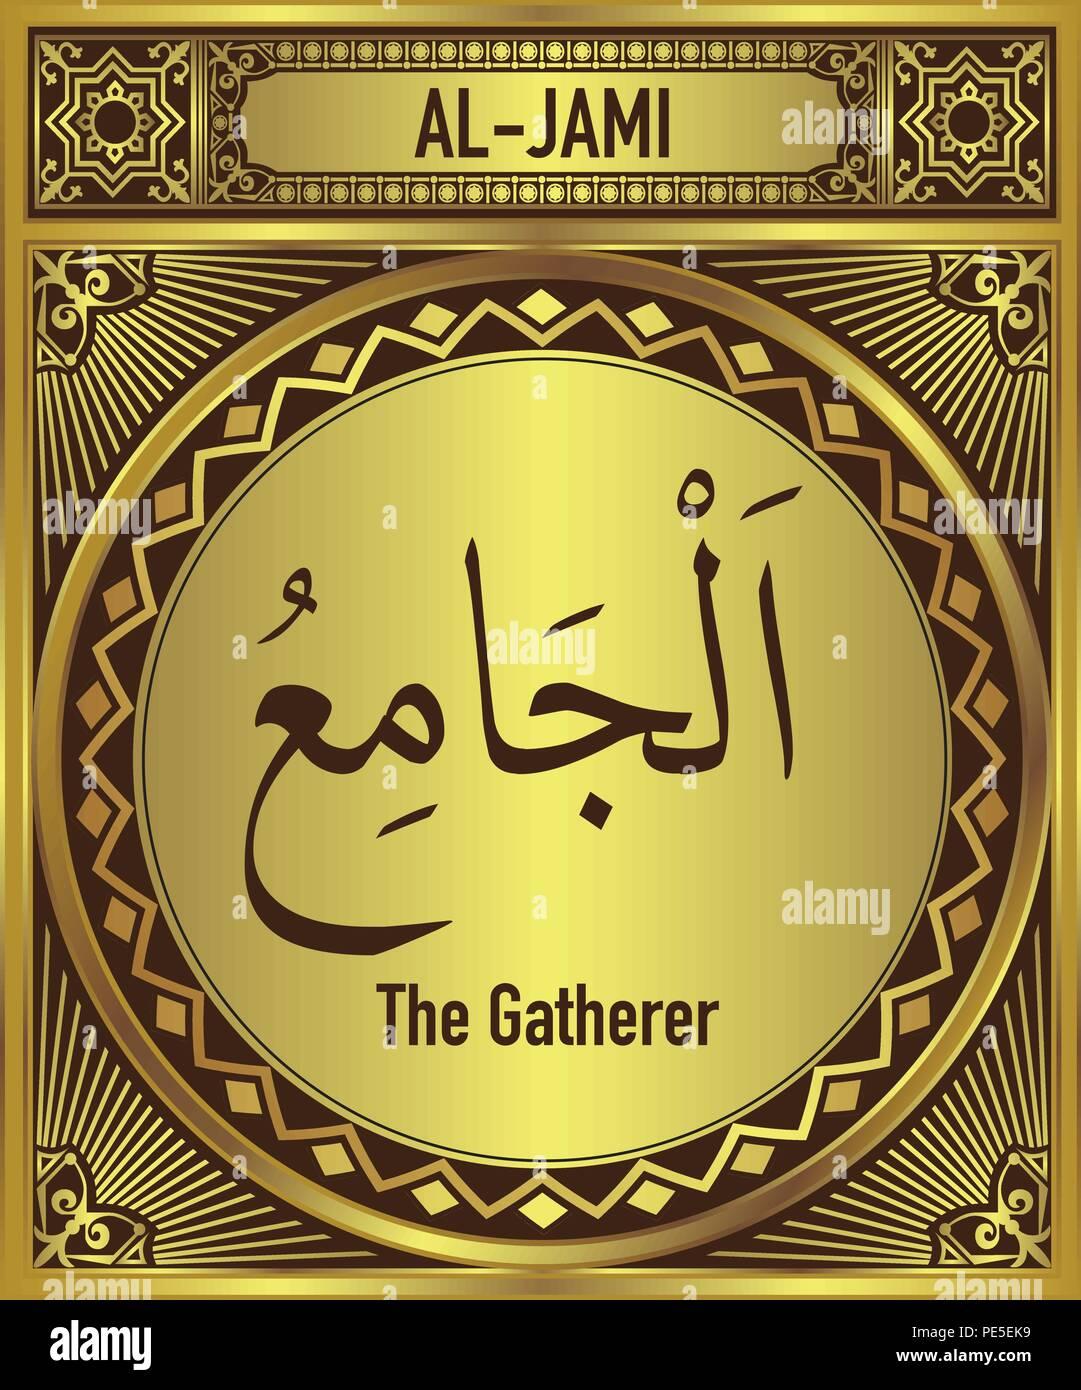 99 Beautiful Names Of Allah English Translate Below The Arabic Calligraphy